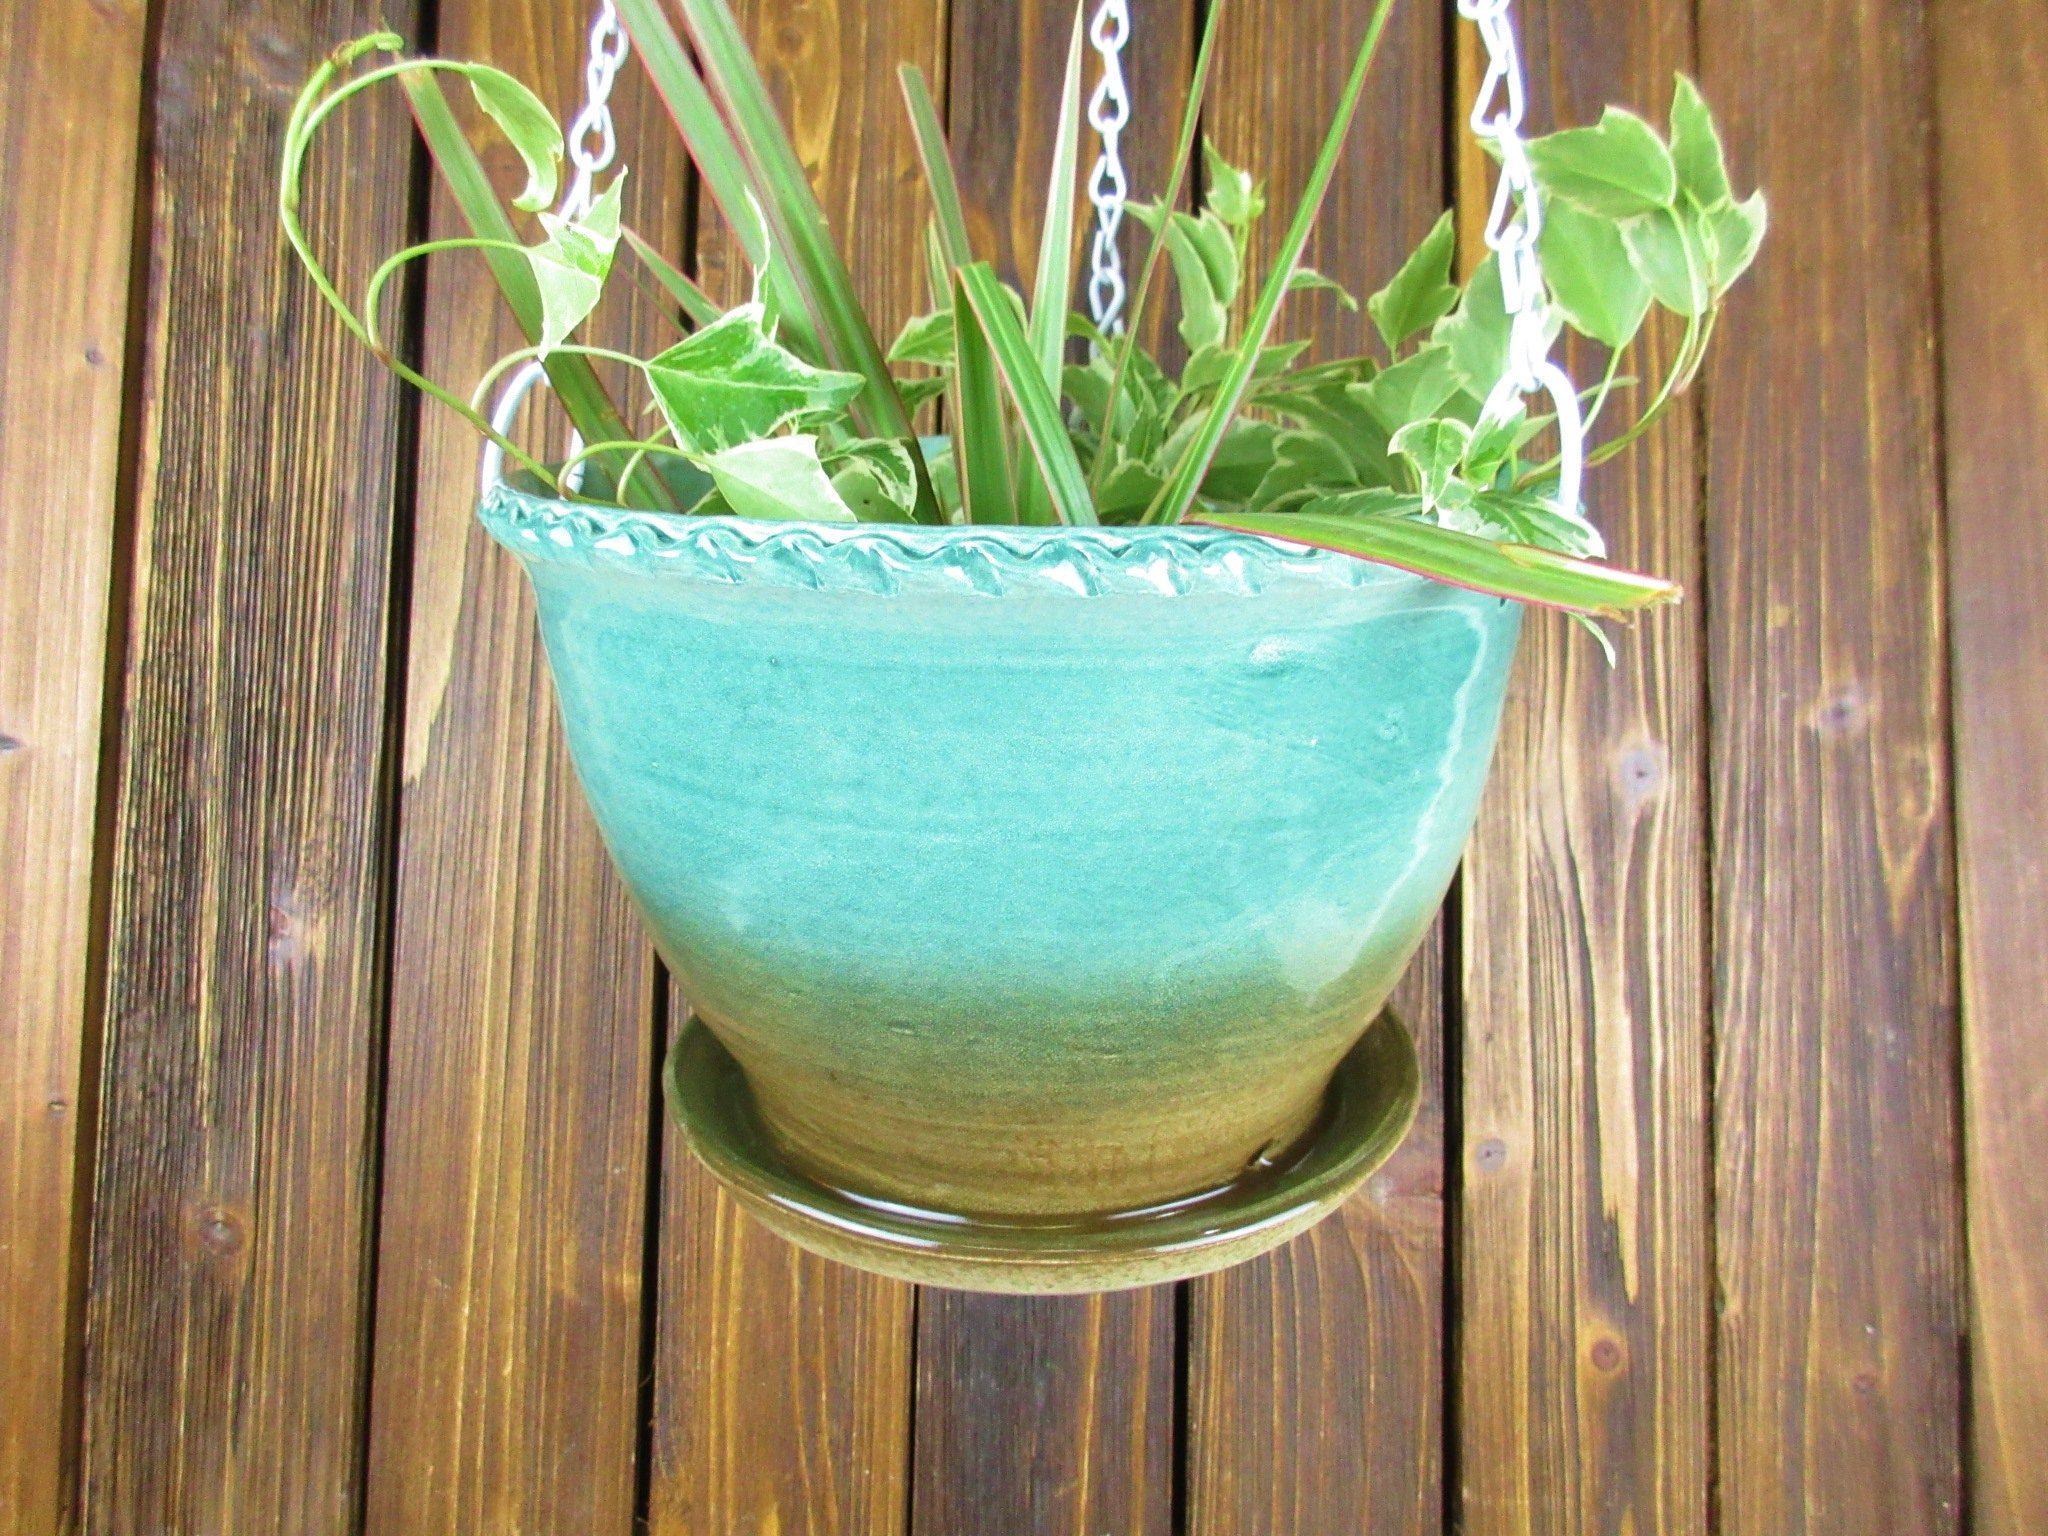 Planter Menthe En Pot hanging pottery planter flower pot for container gardening, gardener gift  outdoor decor art planter ceramic 8 inch diameter, 5 inches tall